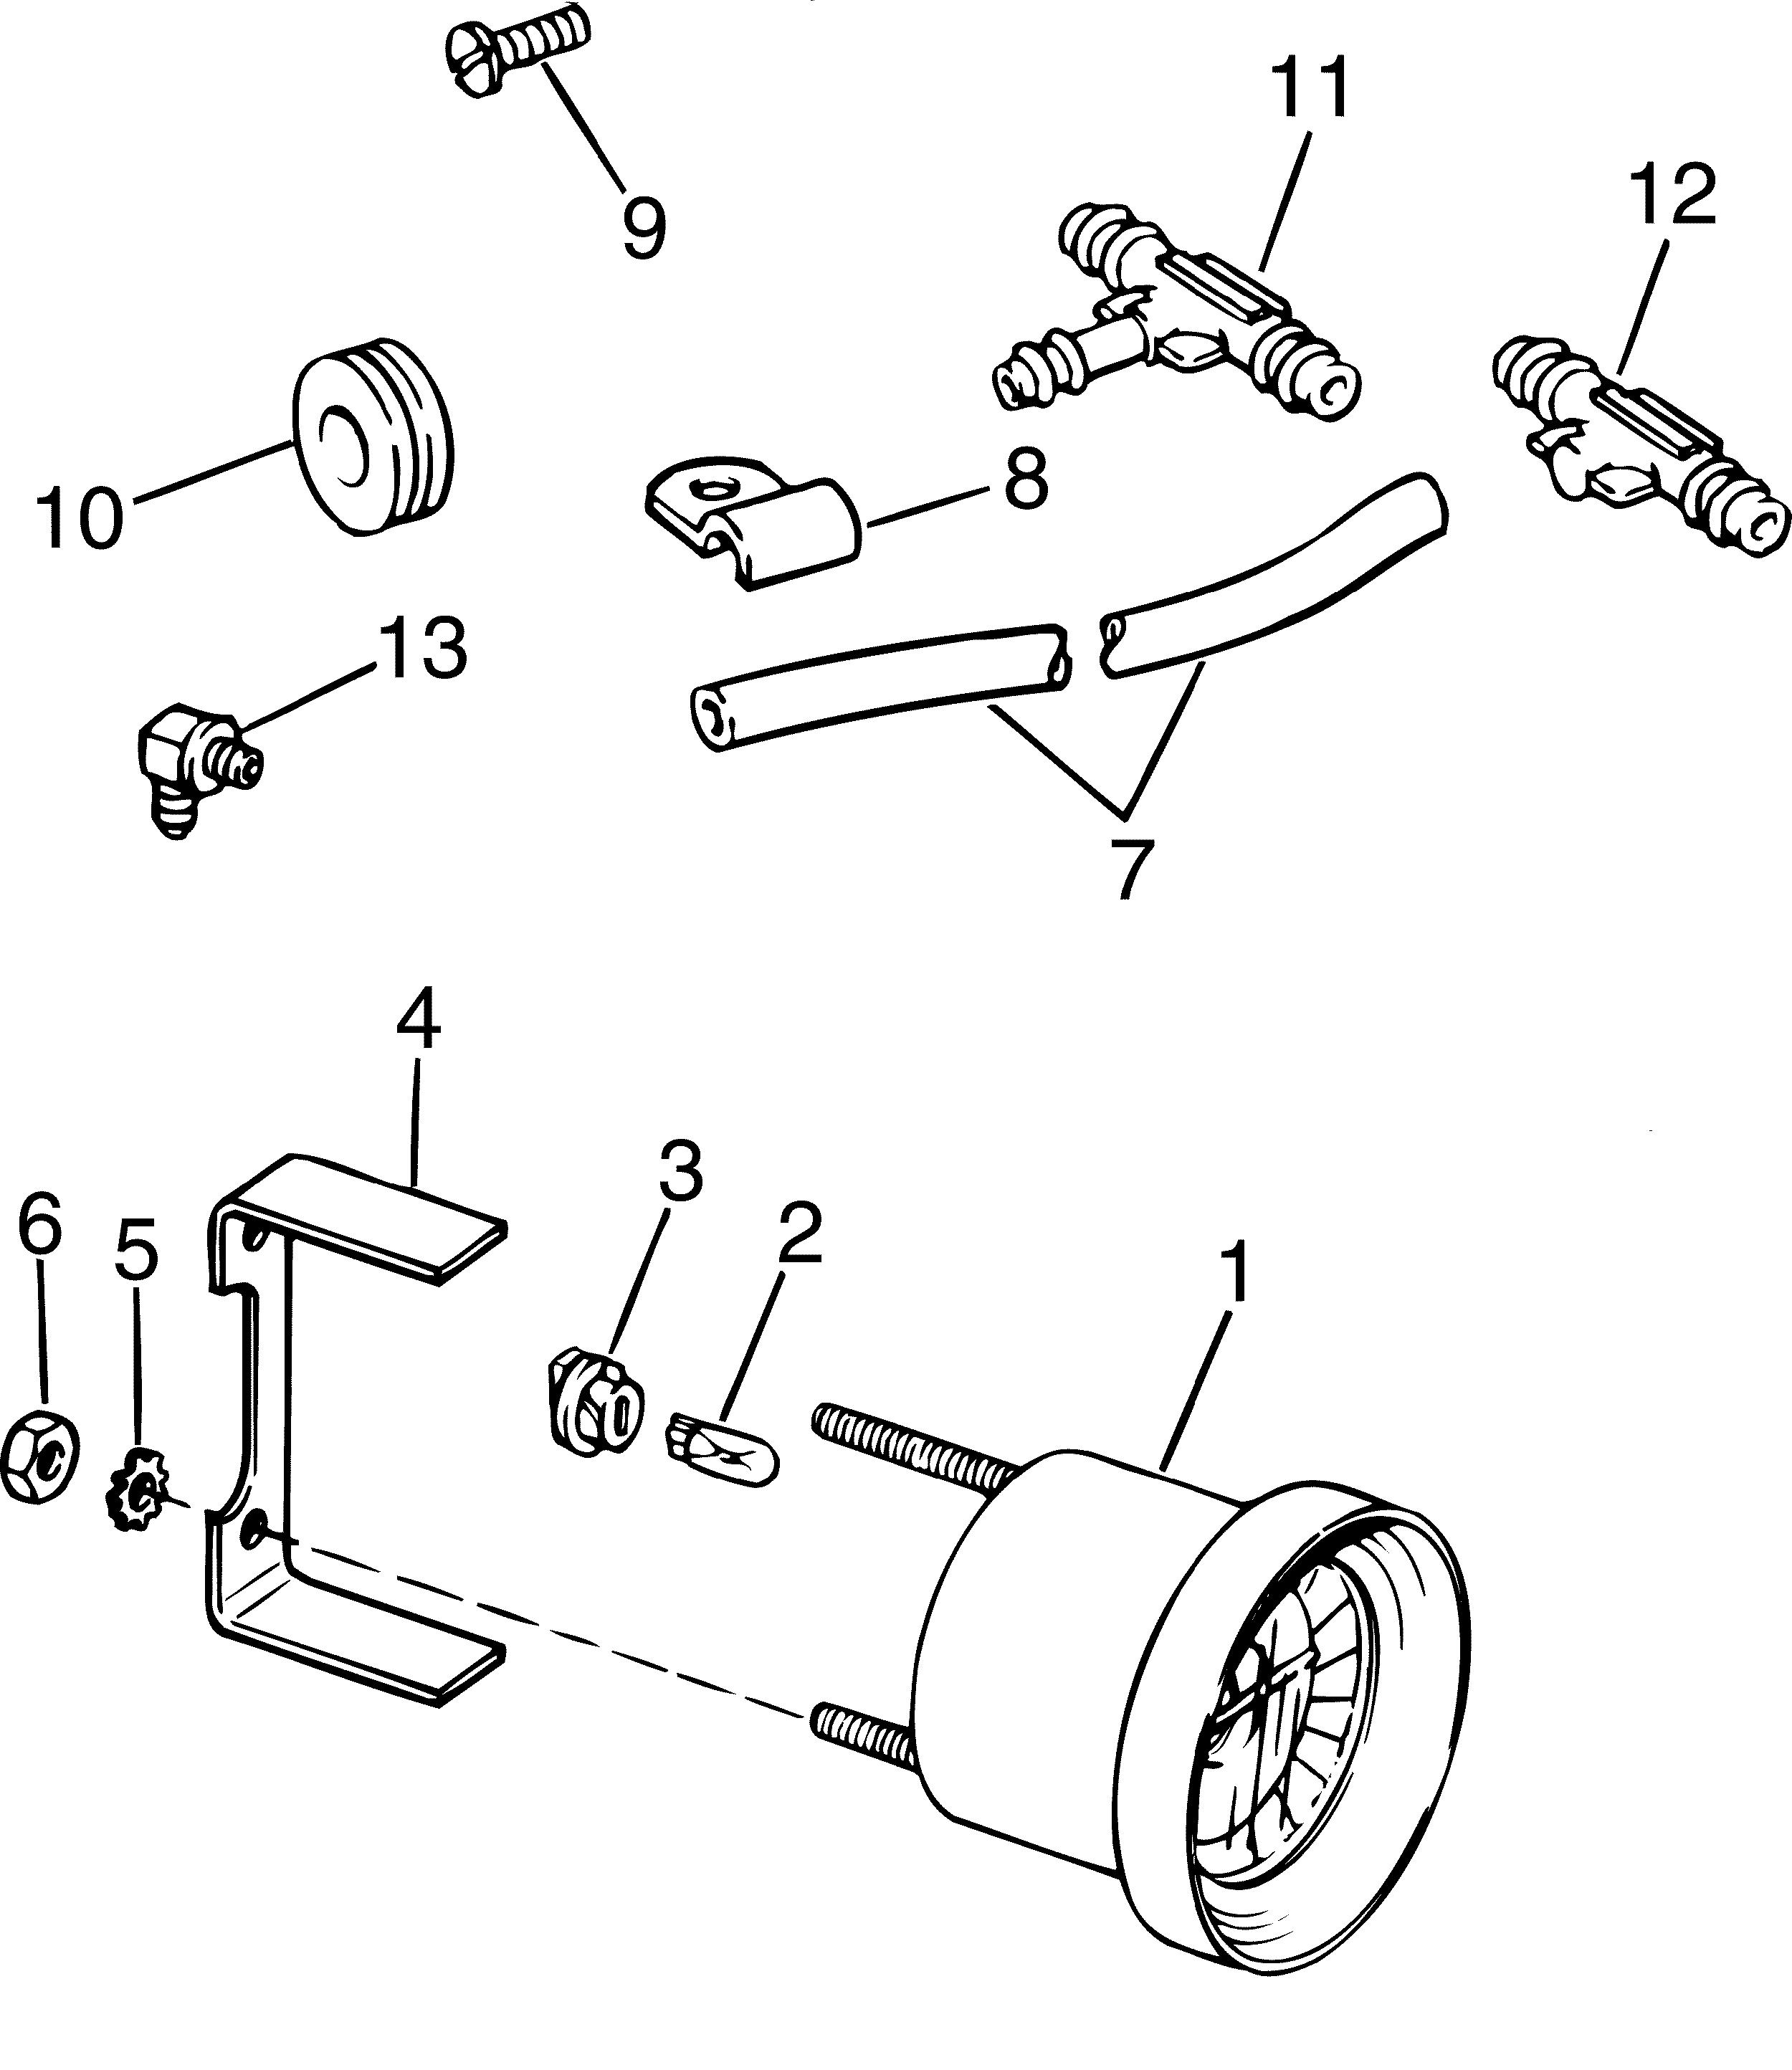 evinrude etec 115 wiring diagram wiring diagram database 1960 75 HP Outboard 25 evinrude e tec problems box wiring diagram evinrude outboard ignition wiring diagram evenrude e tec